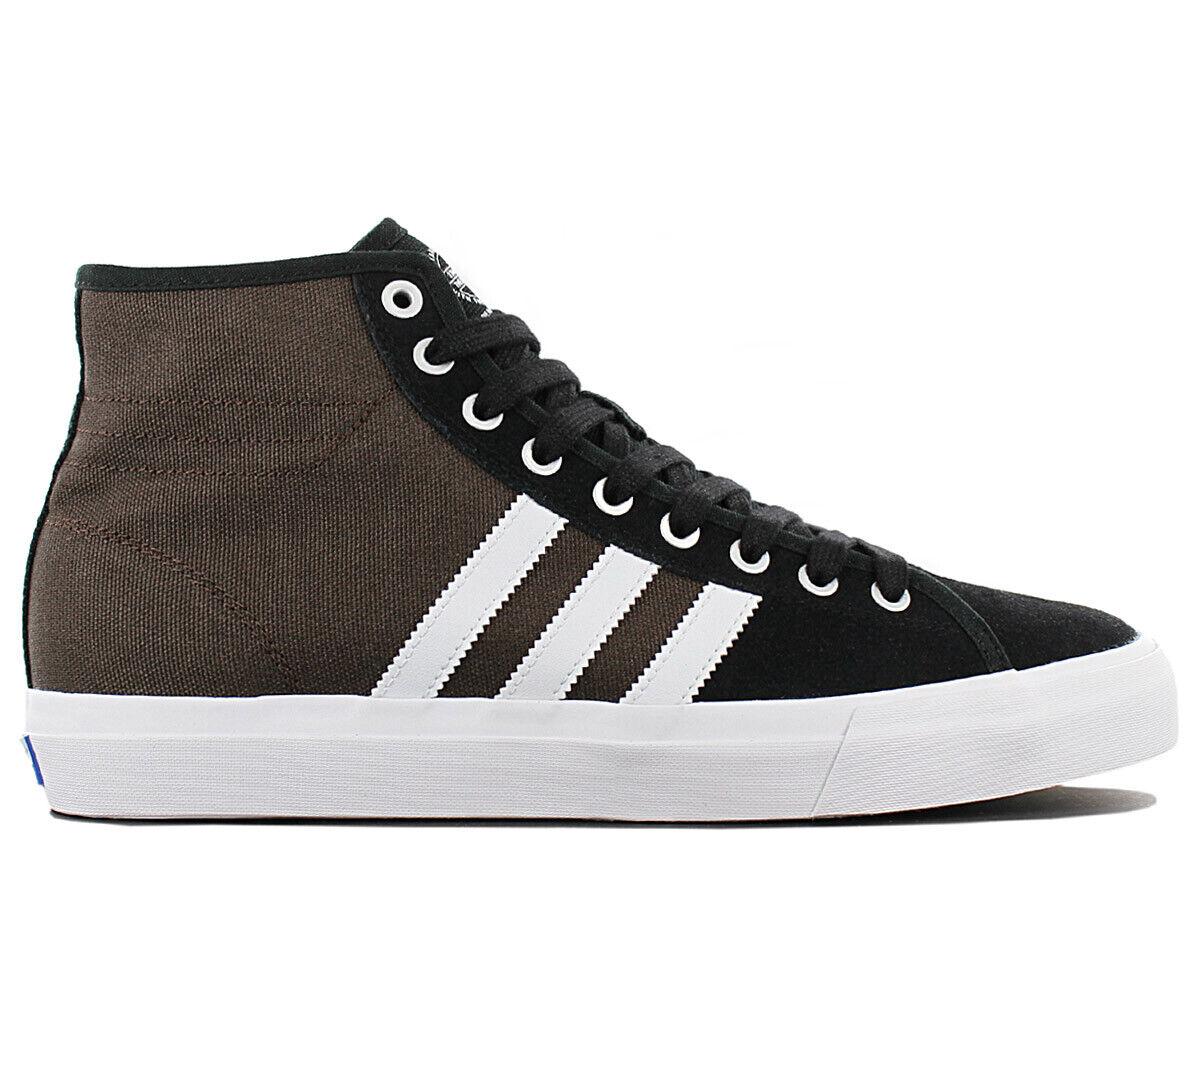 Adidas Originals matchcourt High RX Mens Sneaker shoes BB8590 NICE NEW